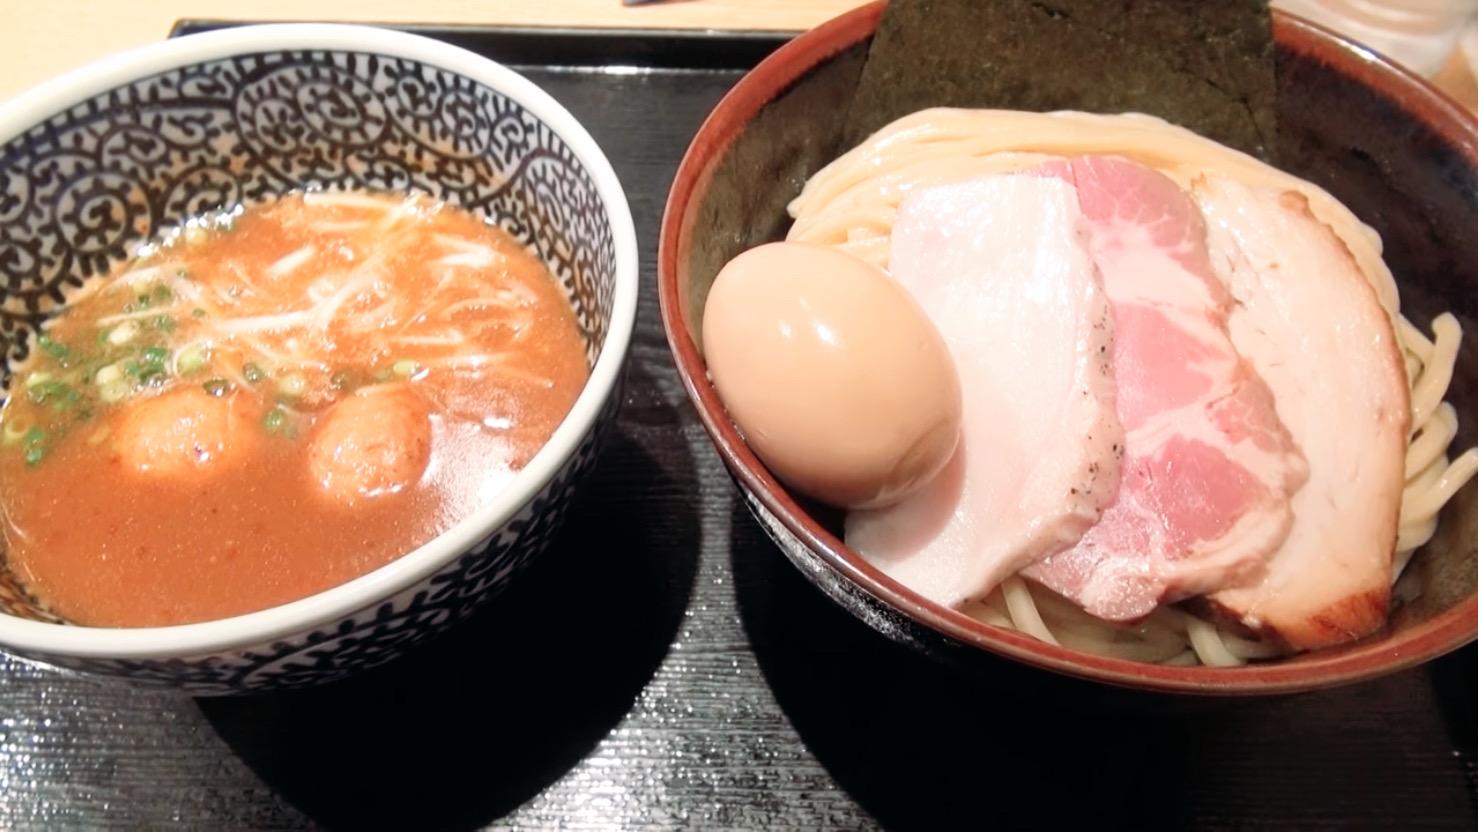 【麺屋一燈】特製濃厚魚介つけめん(中盛) (東京都葛飾区東新小岩) 第202回